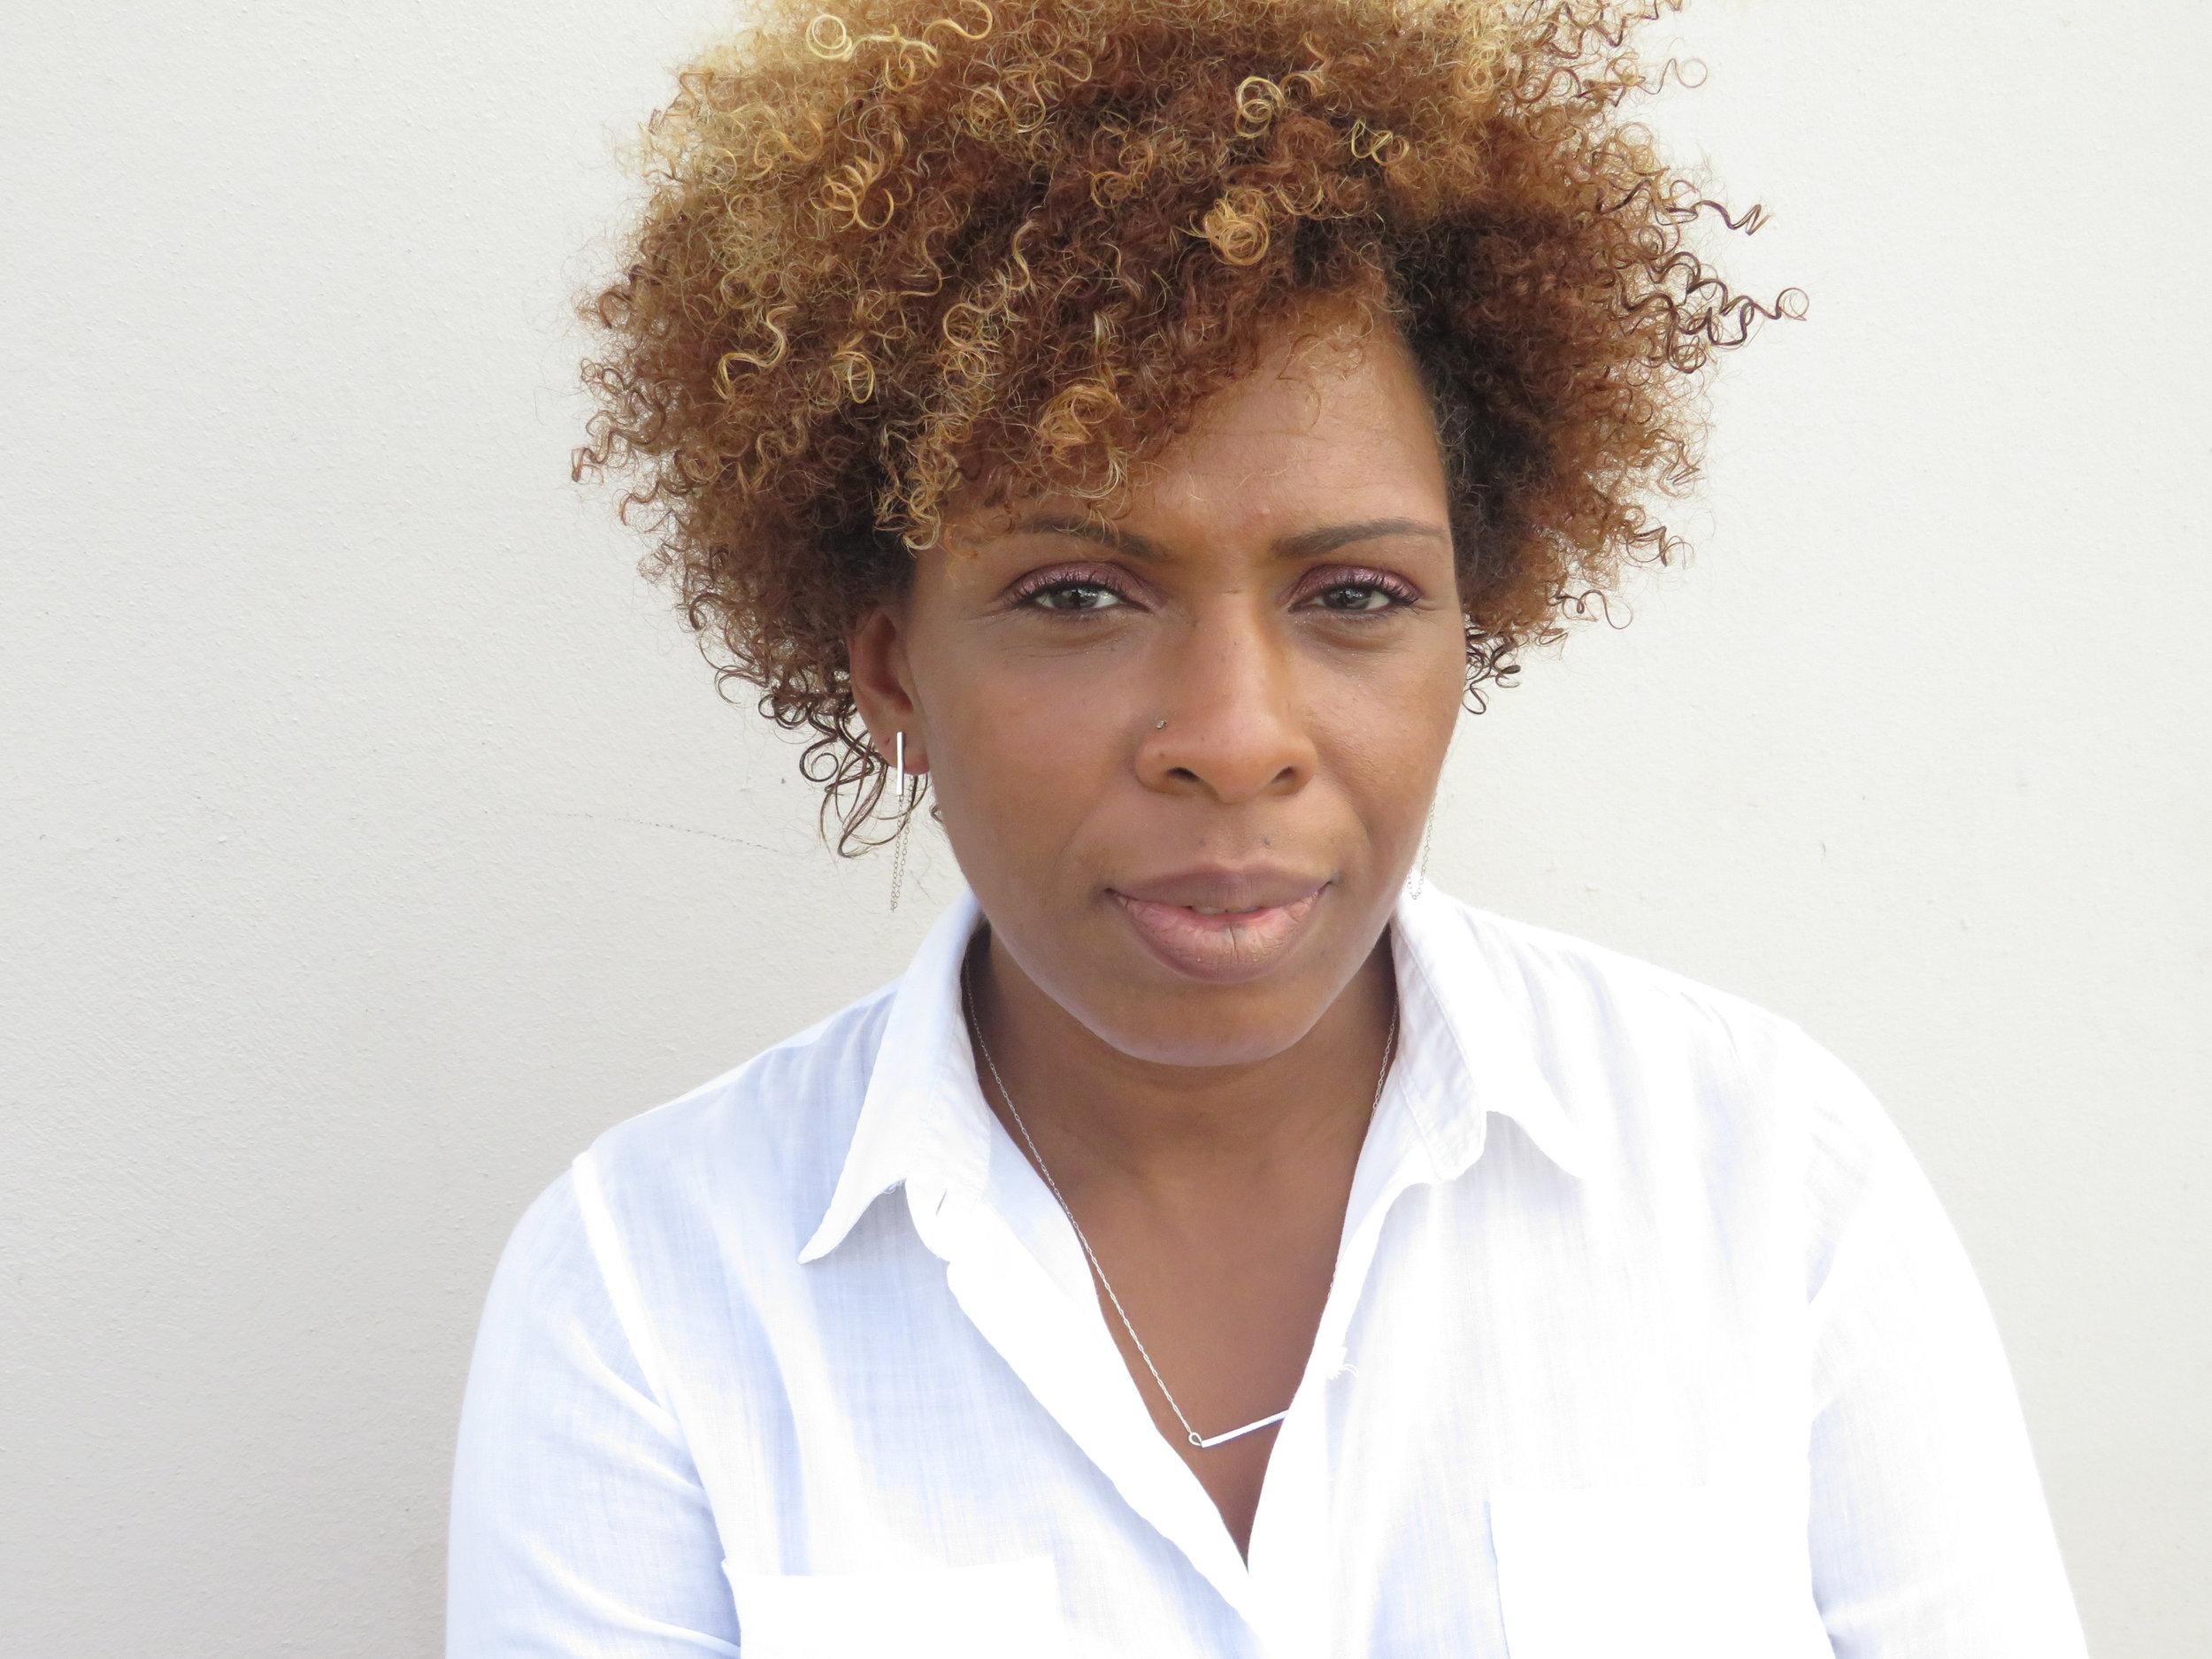 MICHELLE ESCOFFERY JOINS PRS BOARD AS WRITER DIRECTOR -